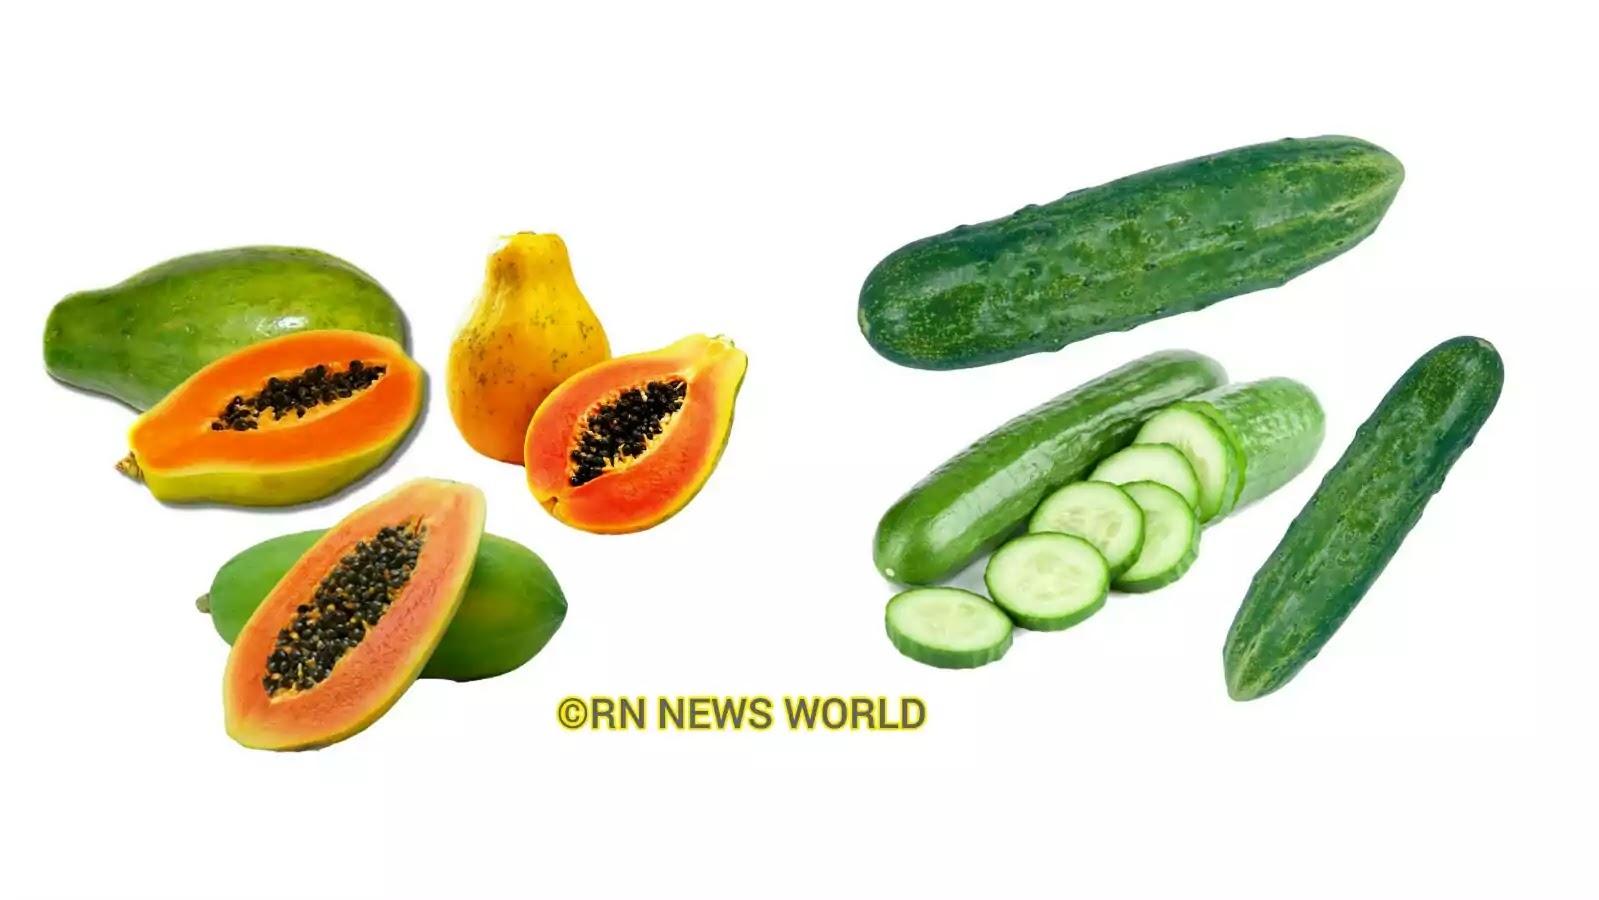 How to use papaya for skin whitening